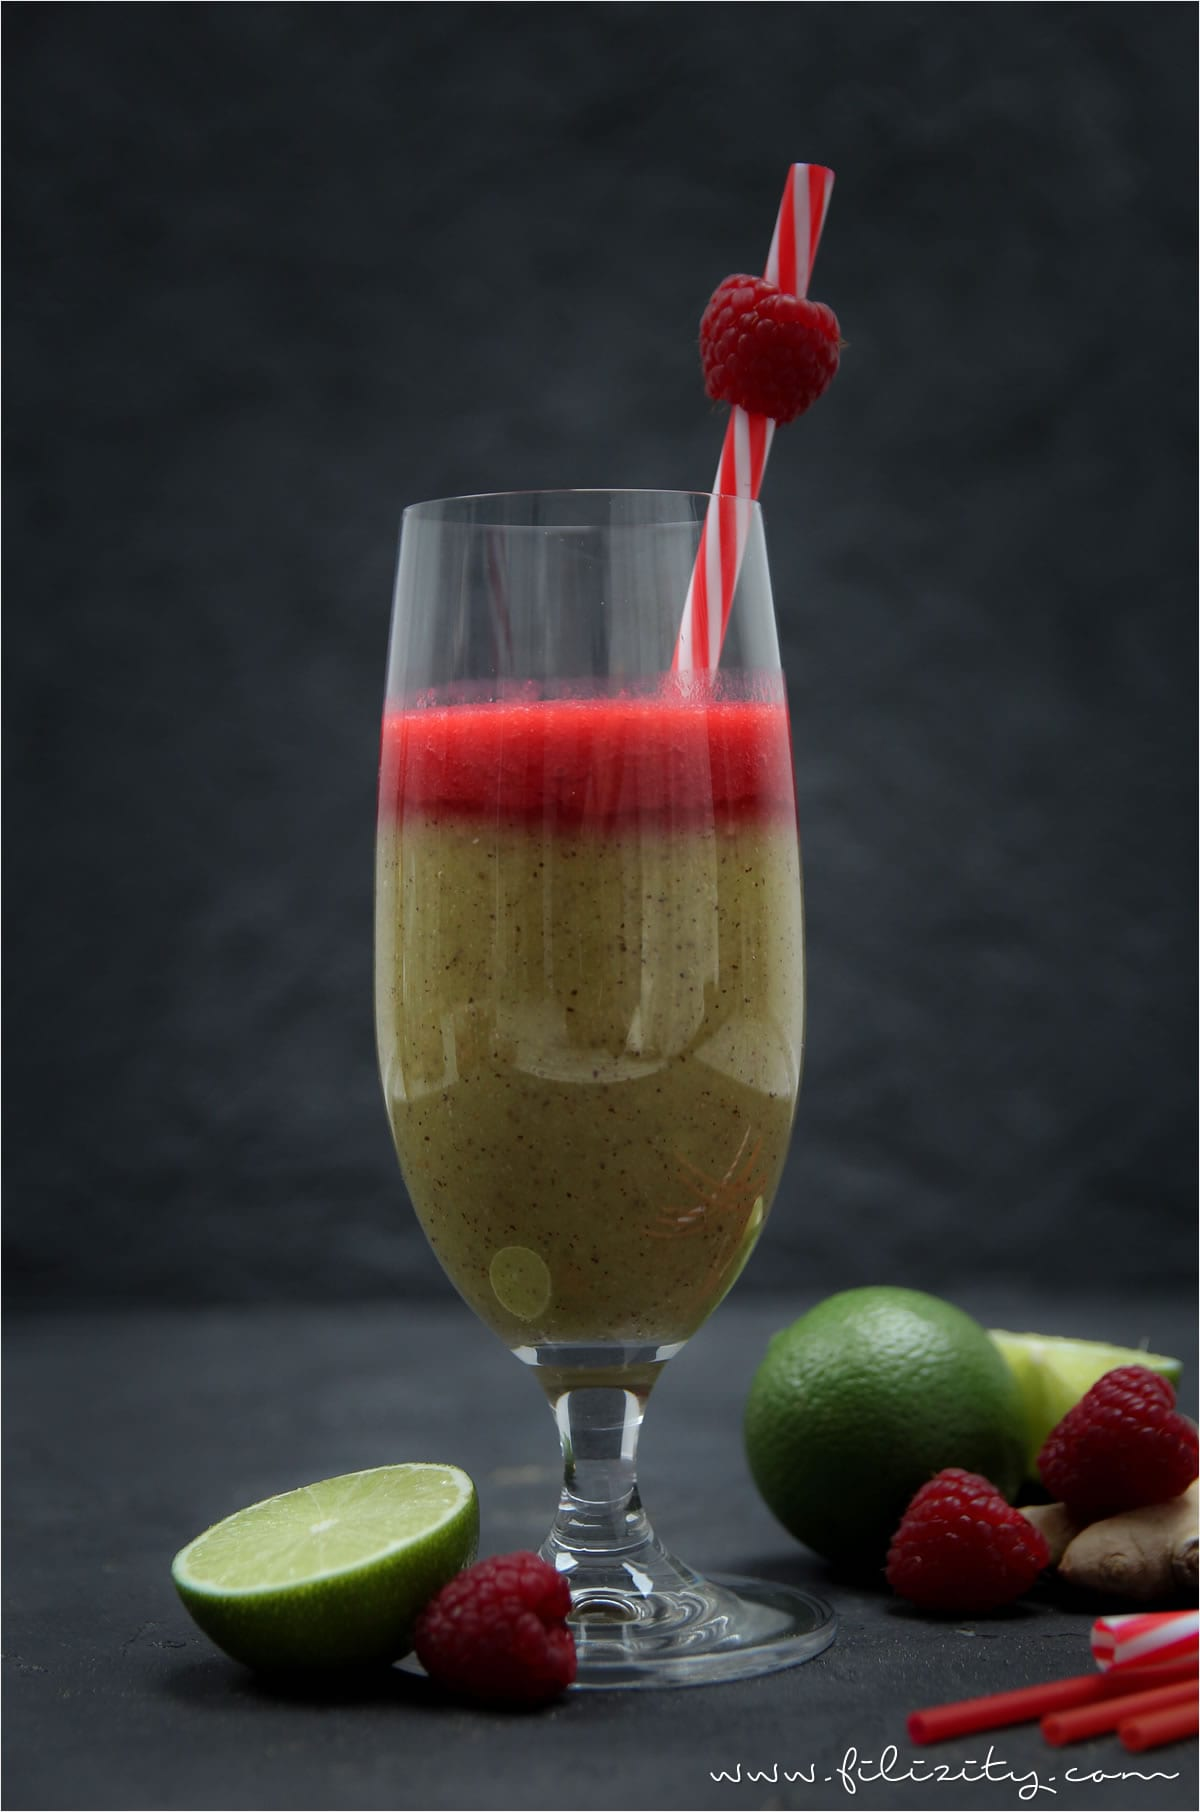 kiwi ananas himbeer smoothie mit ingwer booster f r das immunsystem. Black Bedroom Furniture Sets. Home Design Ideas